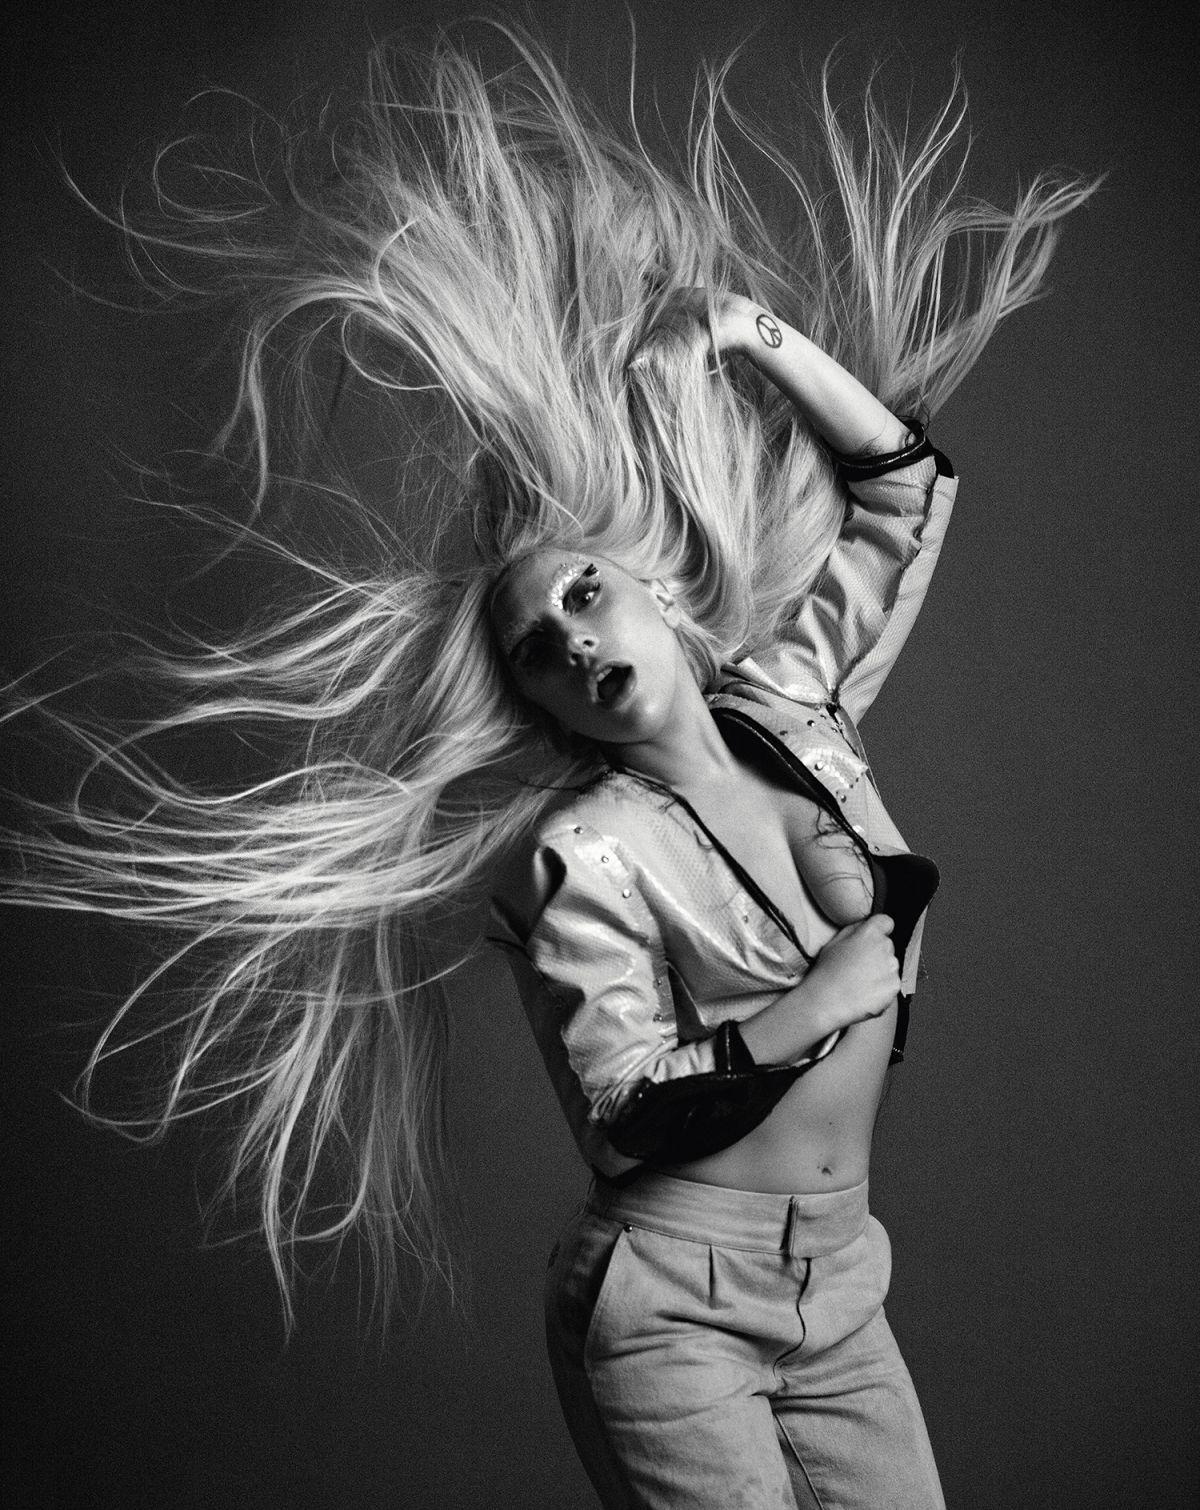 lady-gaga-at-inez-and-vinoodh-photoshoot-for-billboard-december-2015_5